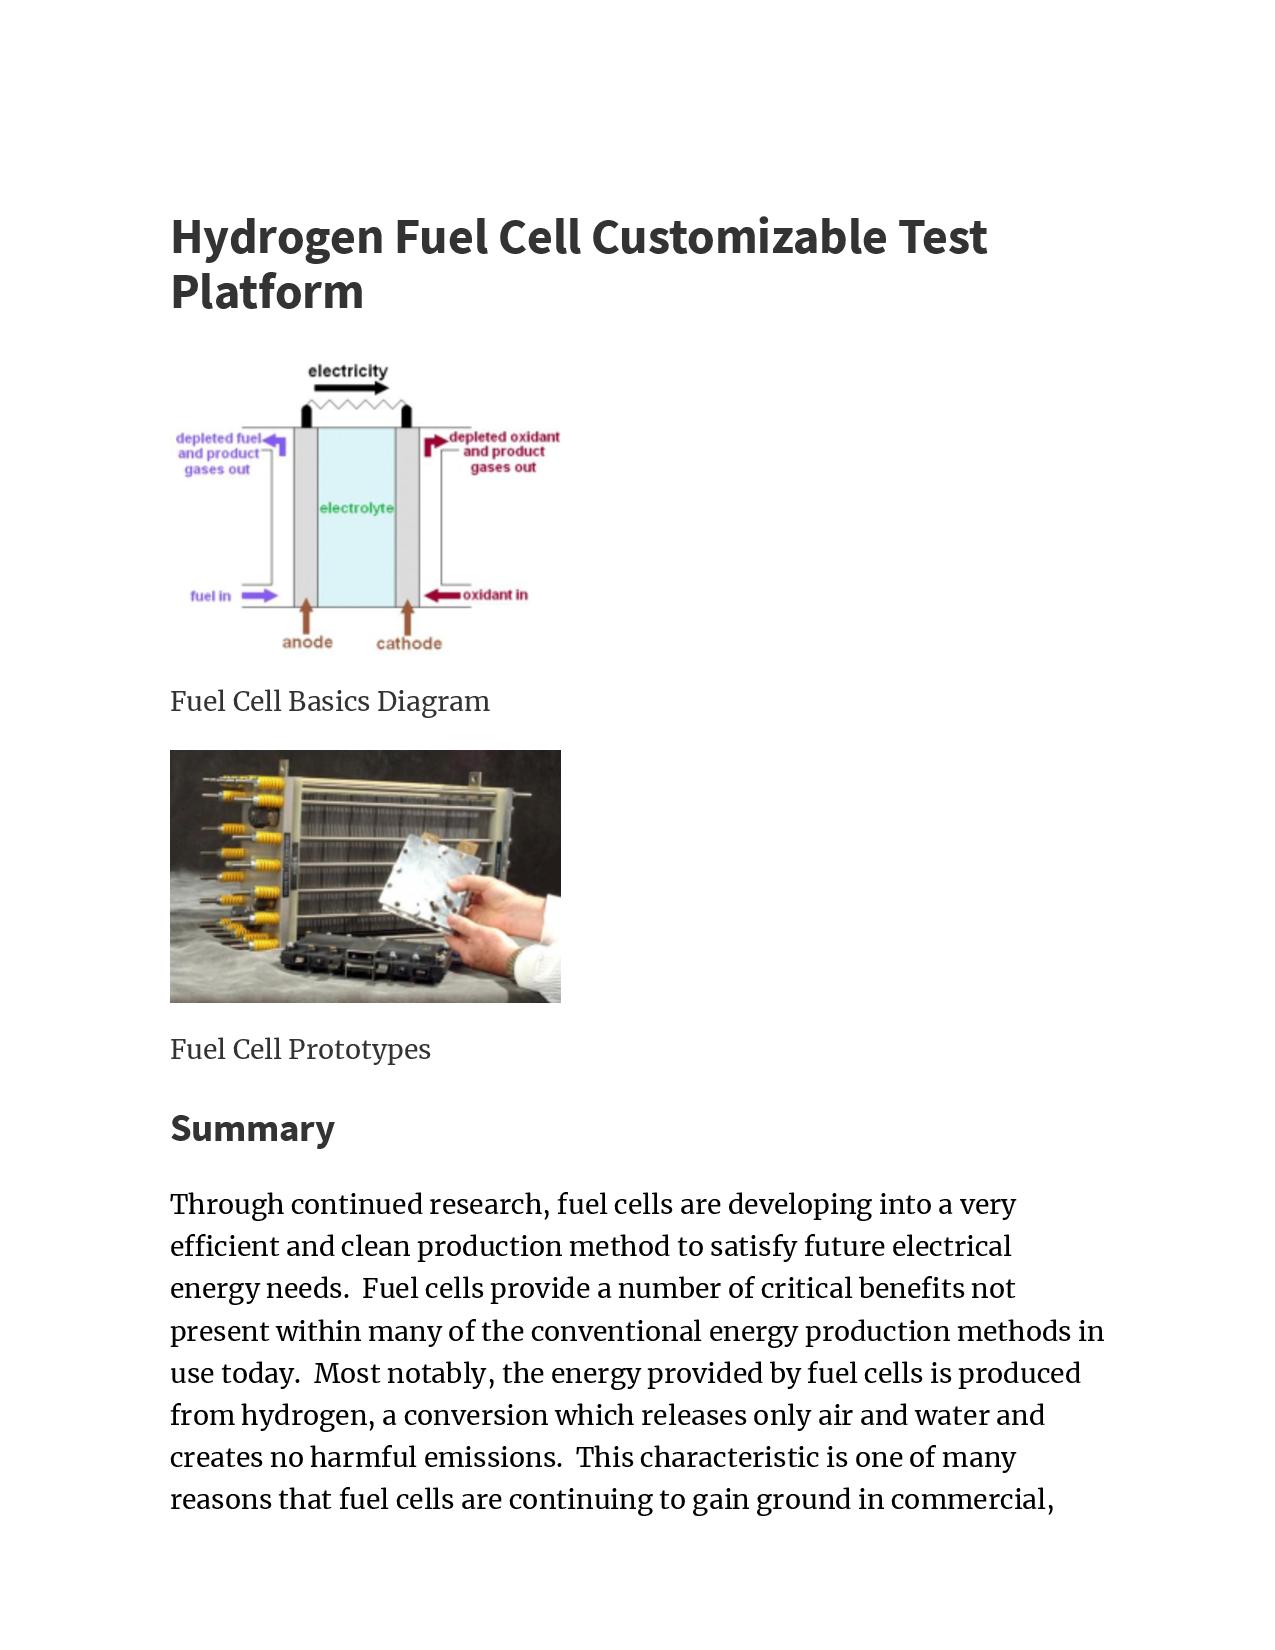 Hydrogen Fuel Cell Customizable Test Platform